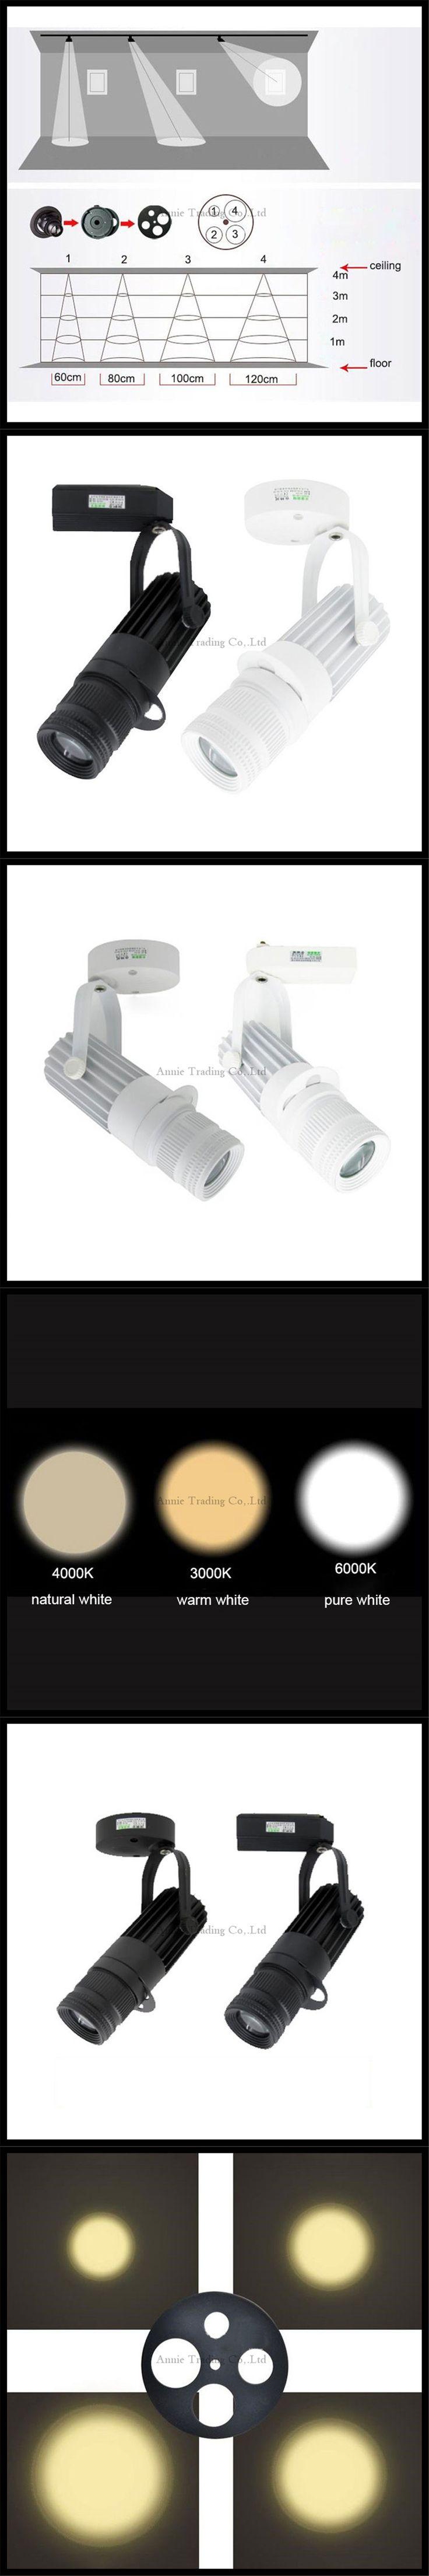 Industrial LED follow spot projector 3W 7W 10W 15W led ceiling spotlights black white tracking spot lamp 4 logo Projection lamp